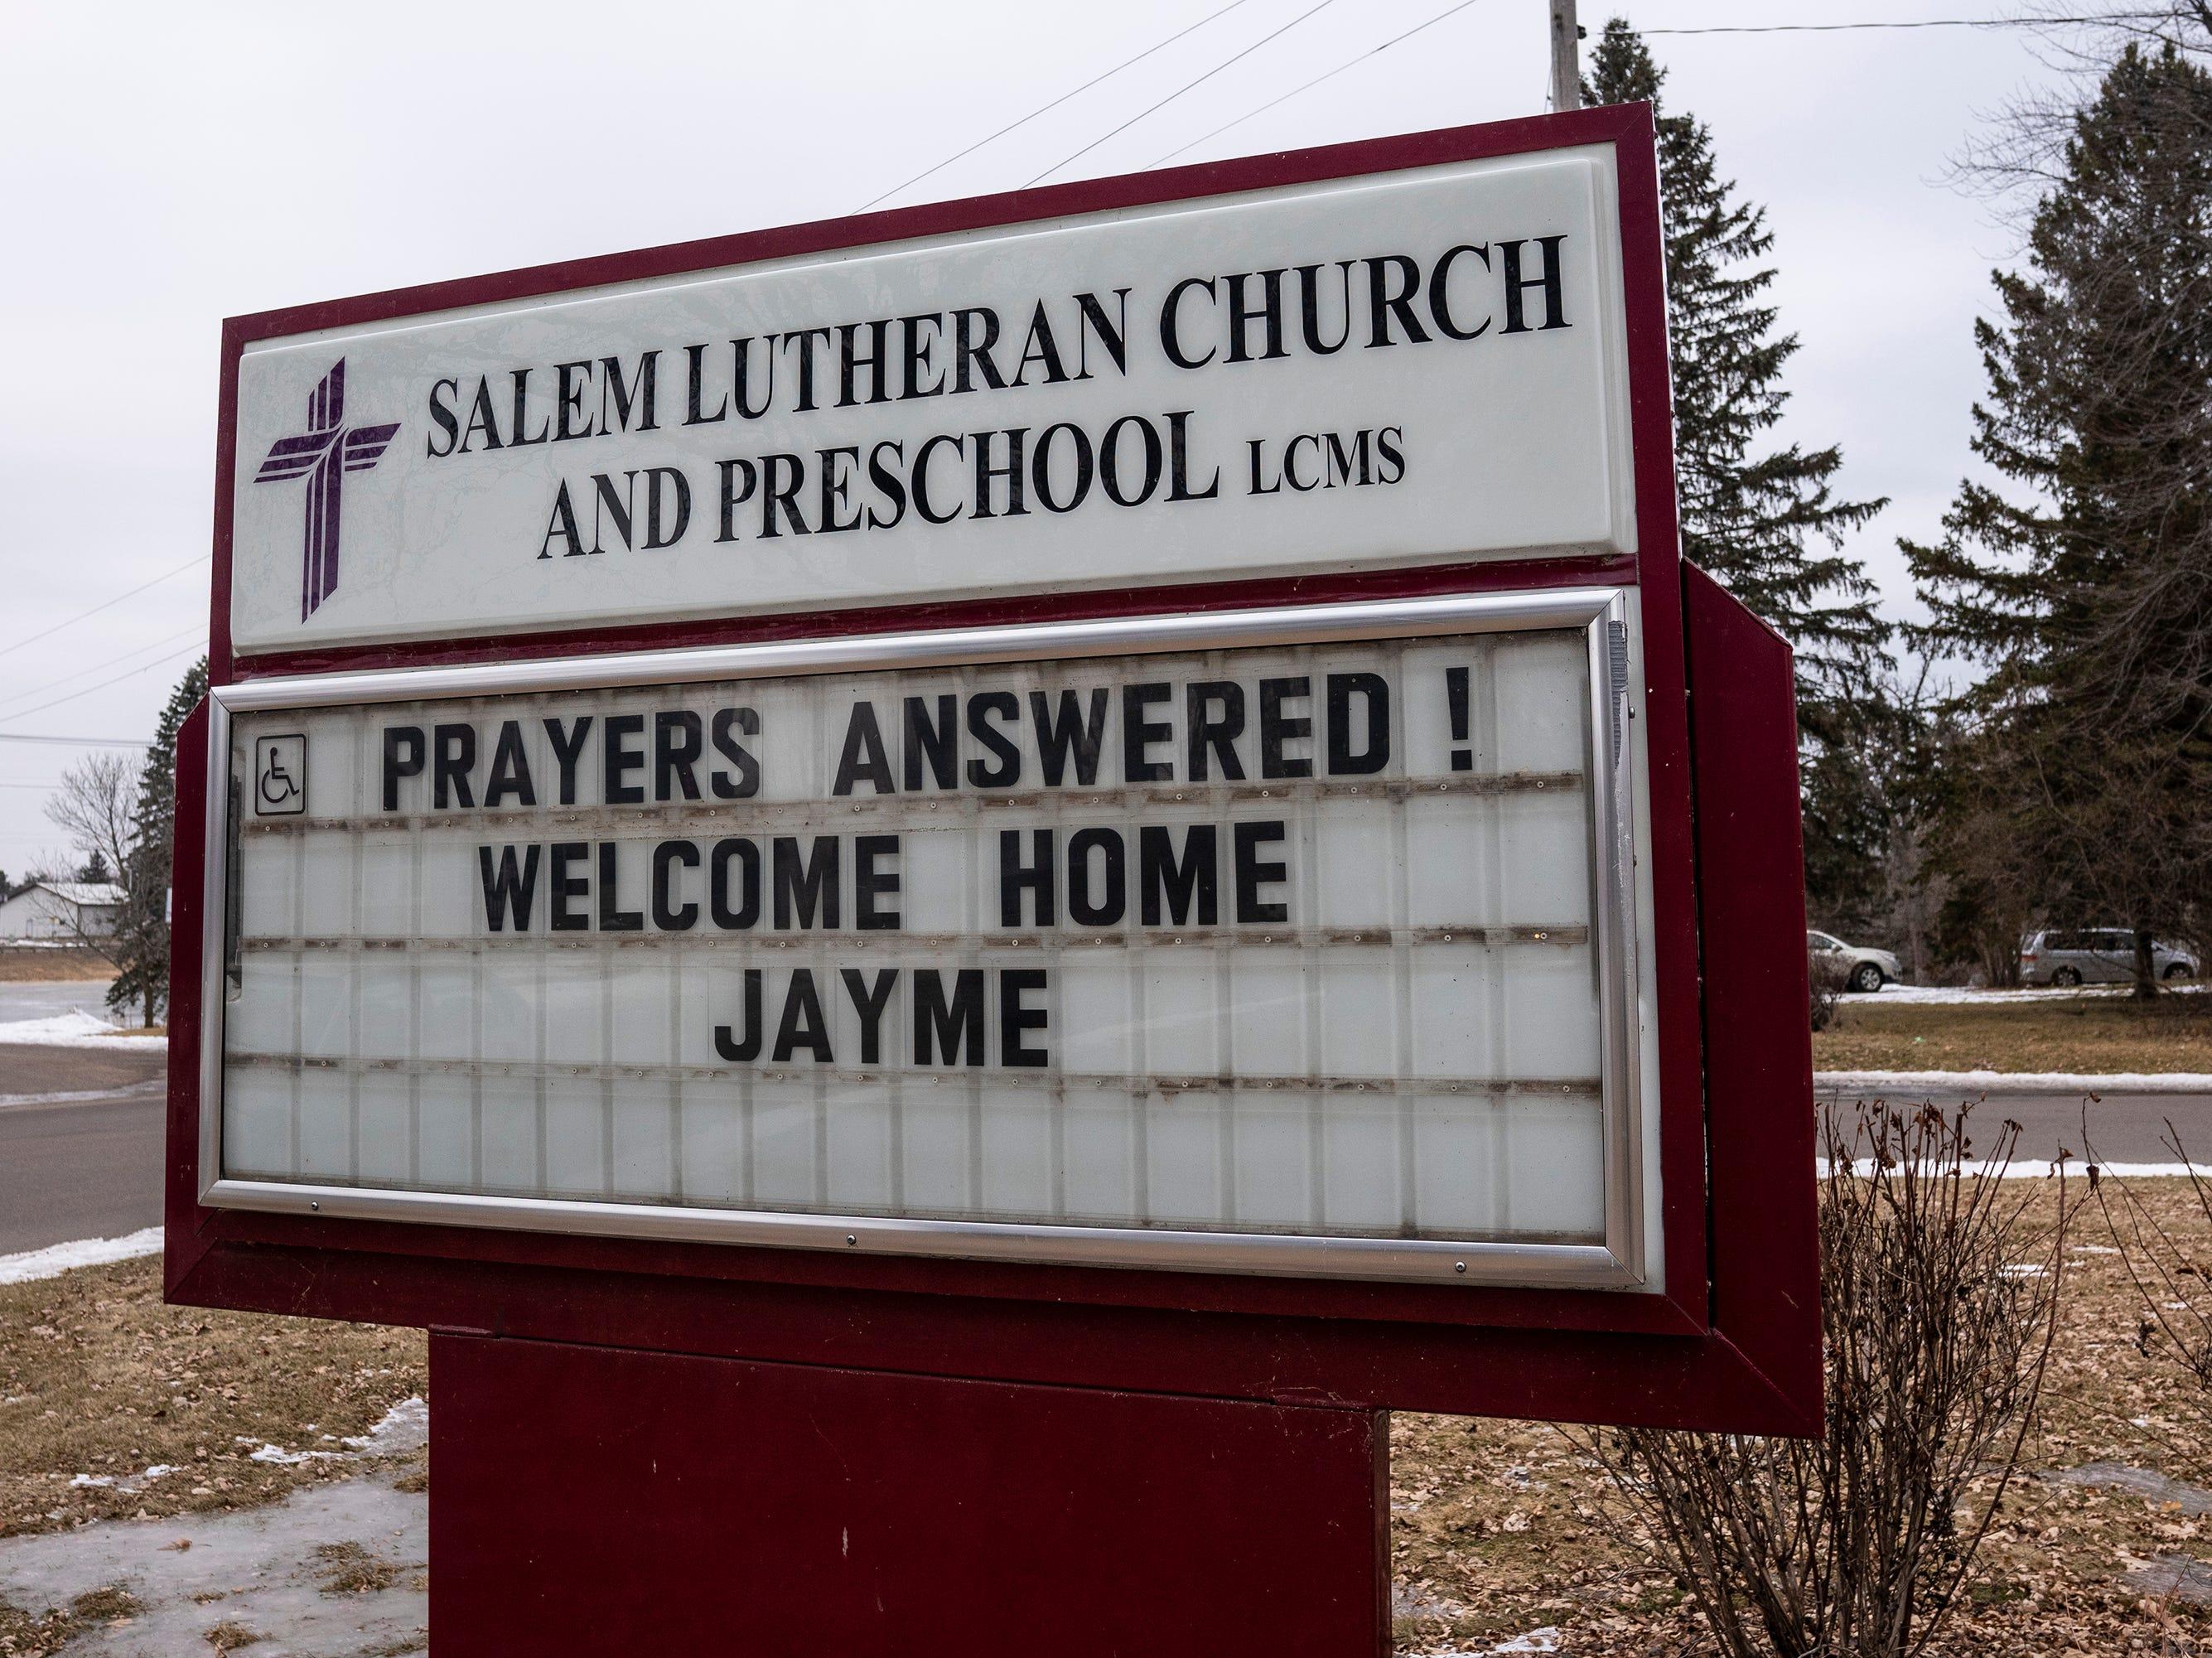 Salem Lutheran Church and Preschool's sign.